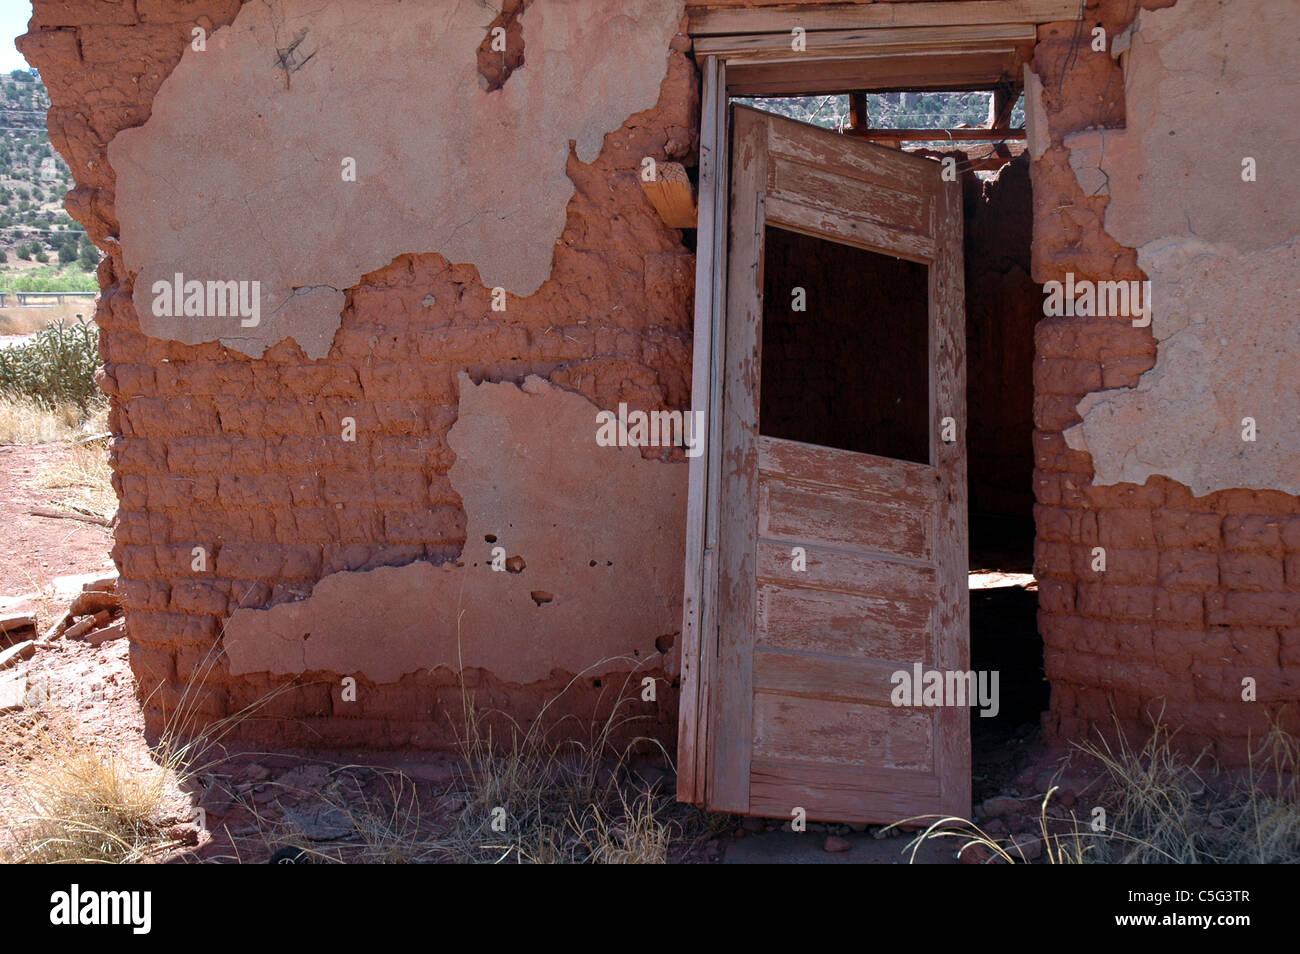 Adobe brick mexico stock photos adobe brick mexico stock for Mud brick kit homes